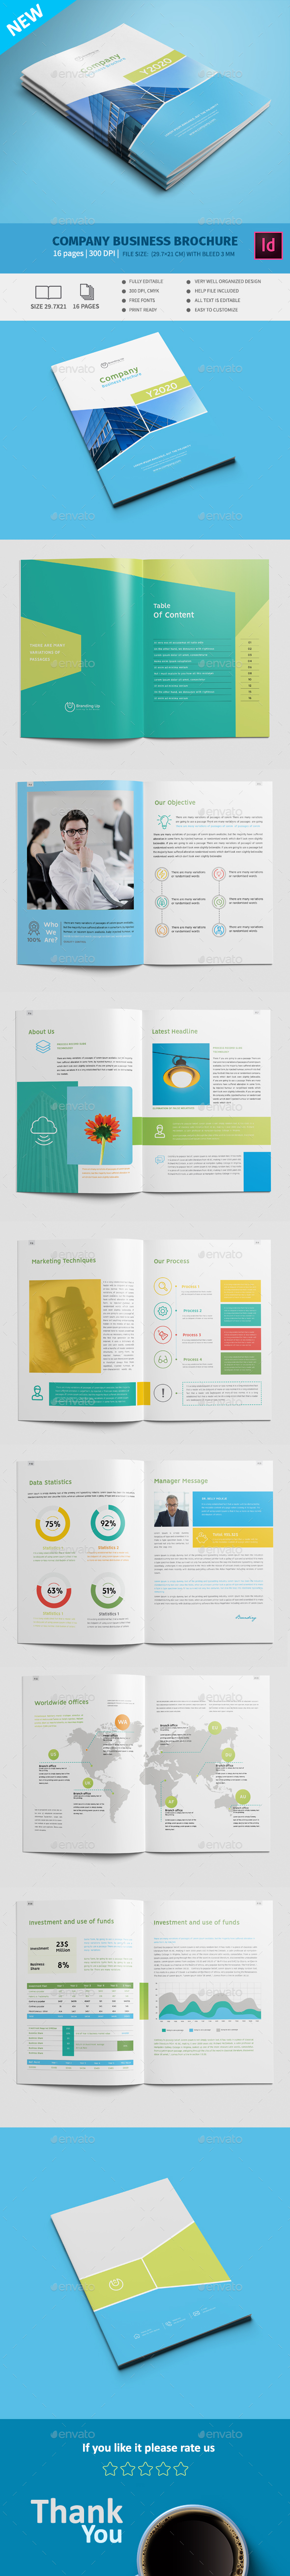 Company Business Brochure - Corporate Brochures